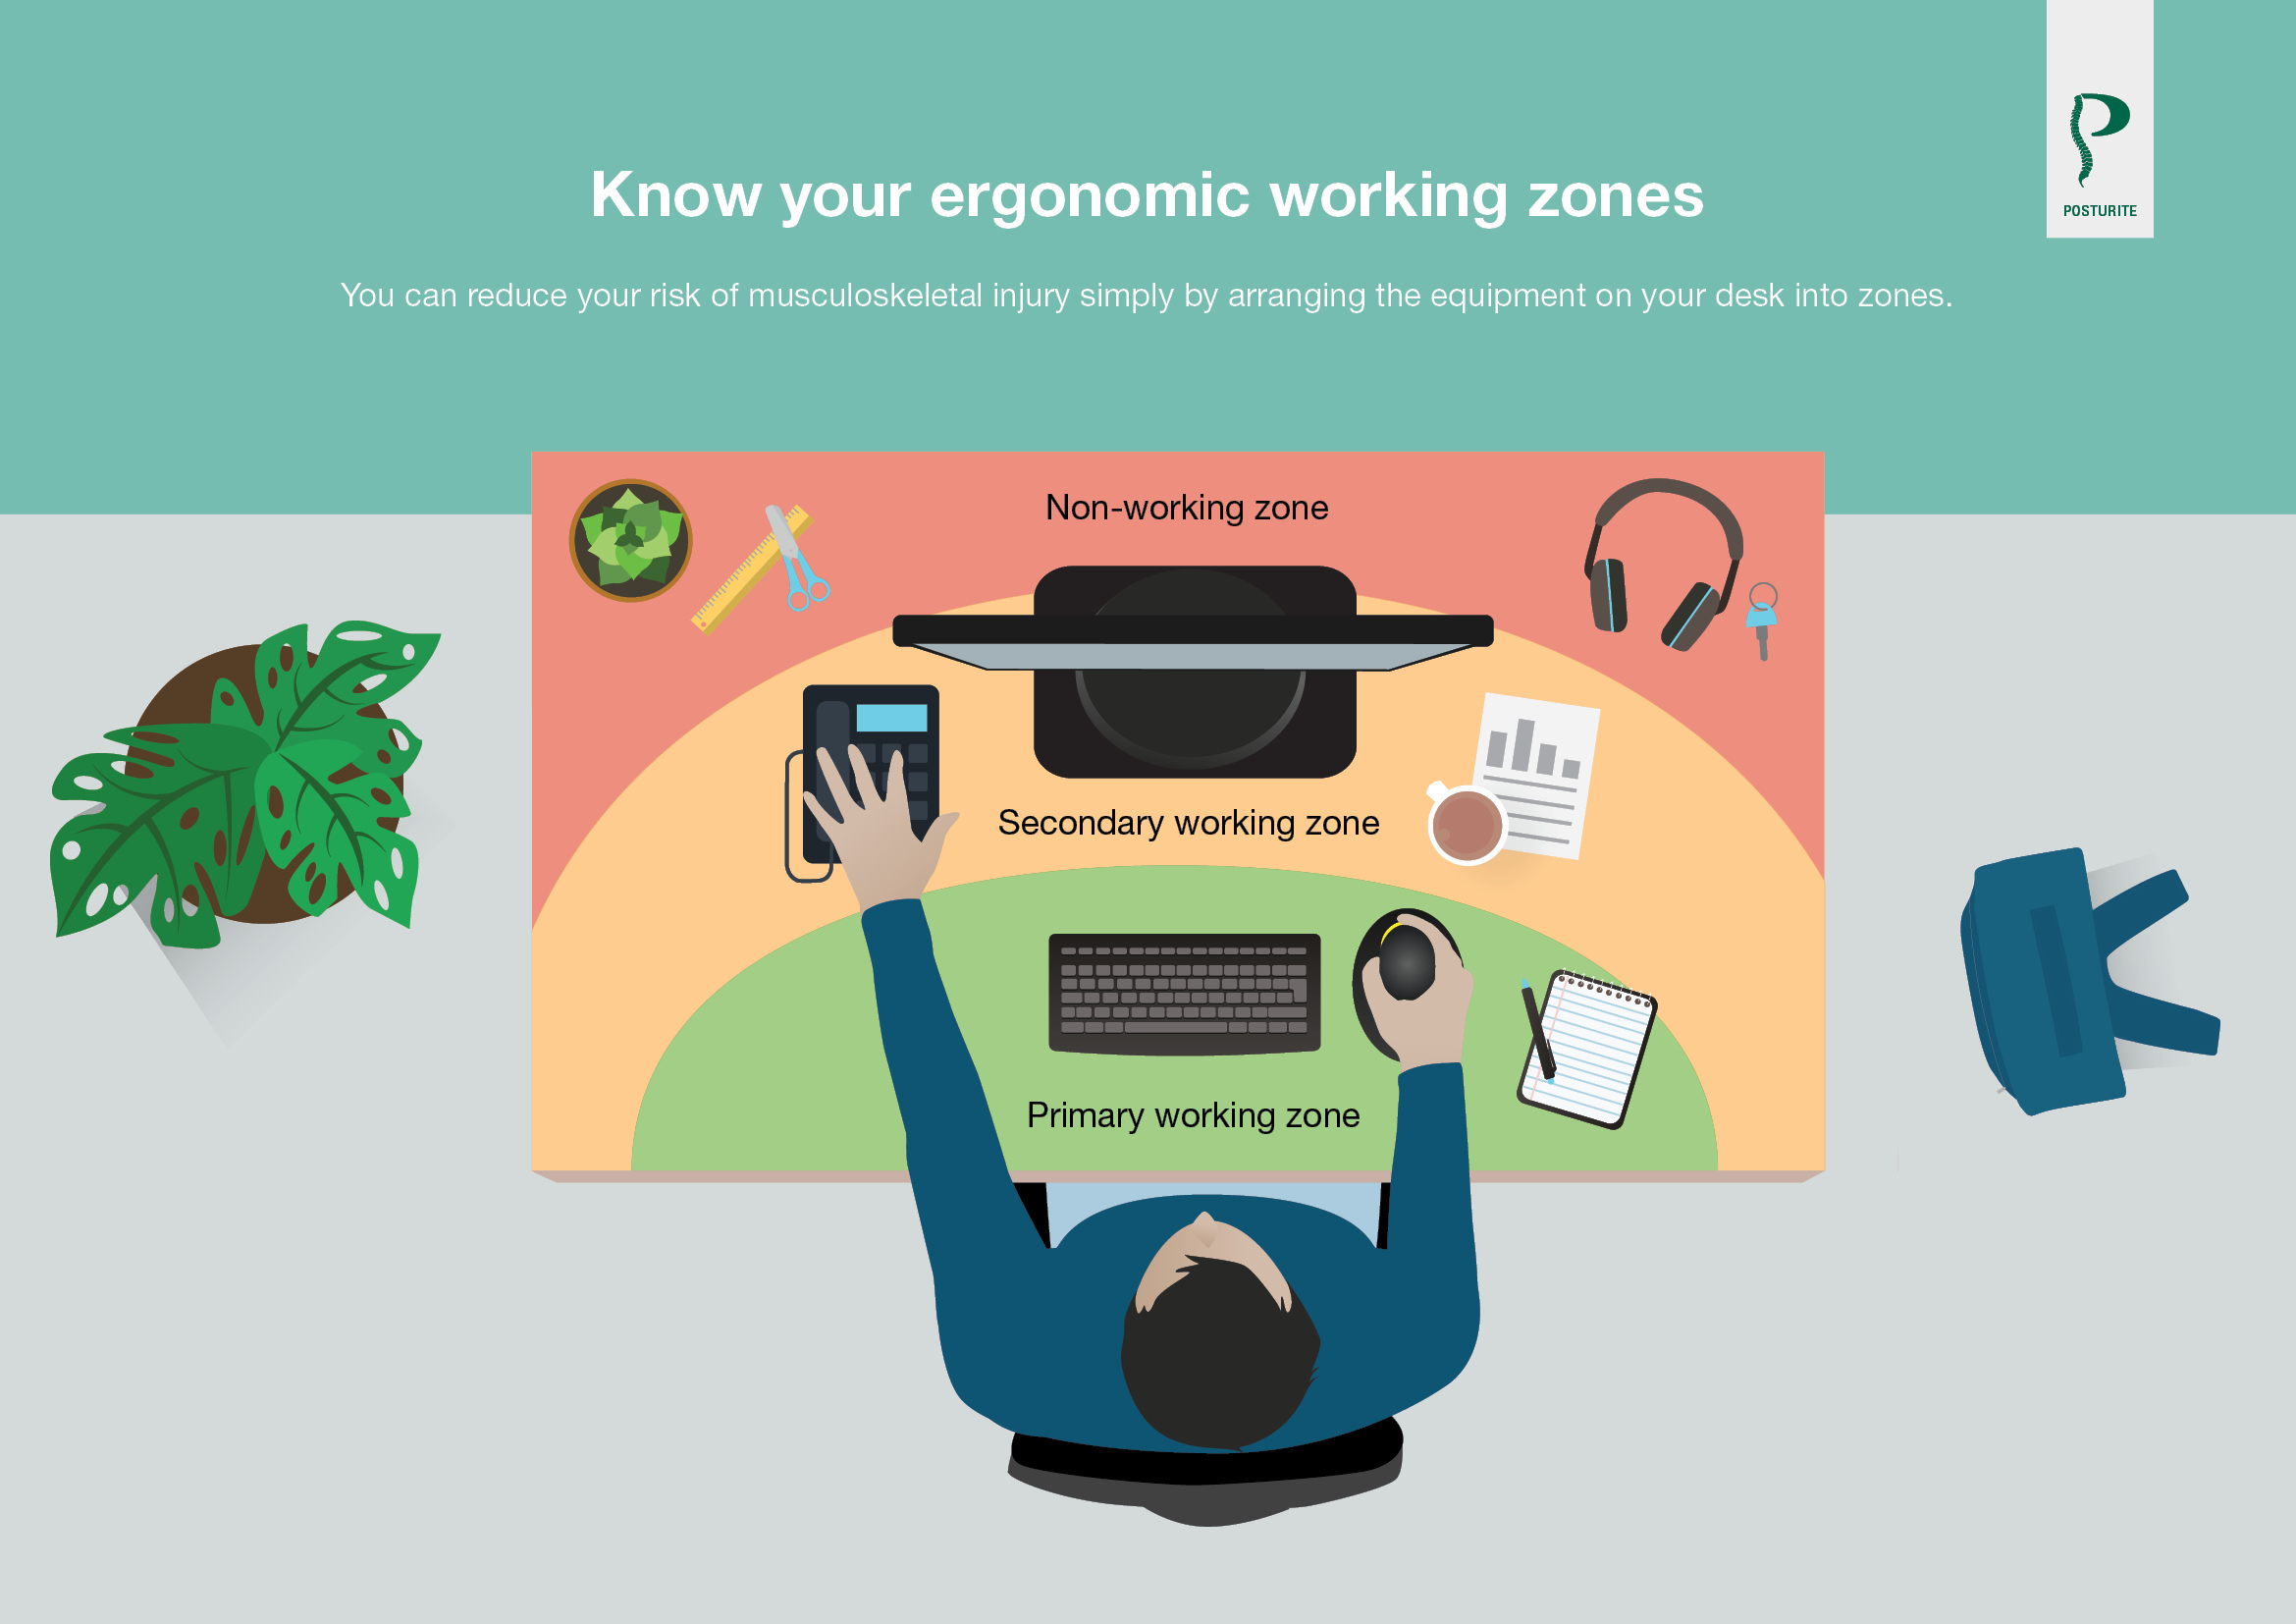 Illustration showing your ergonomic working zones